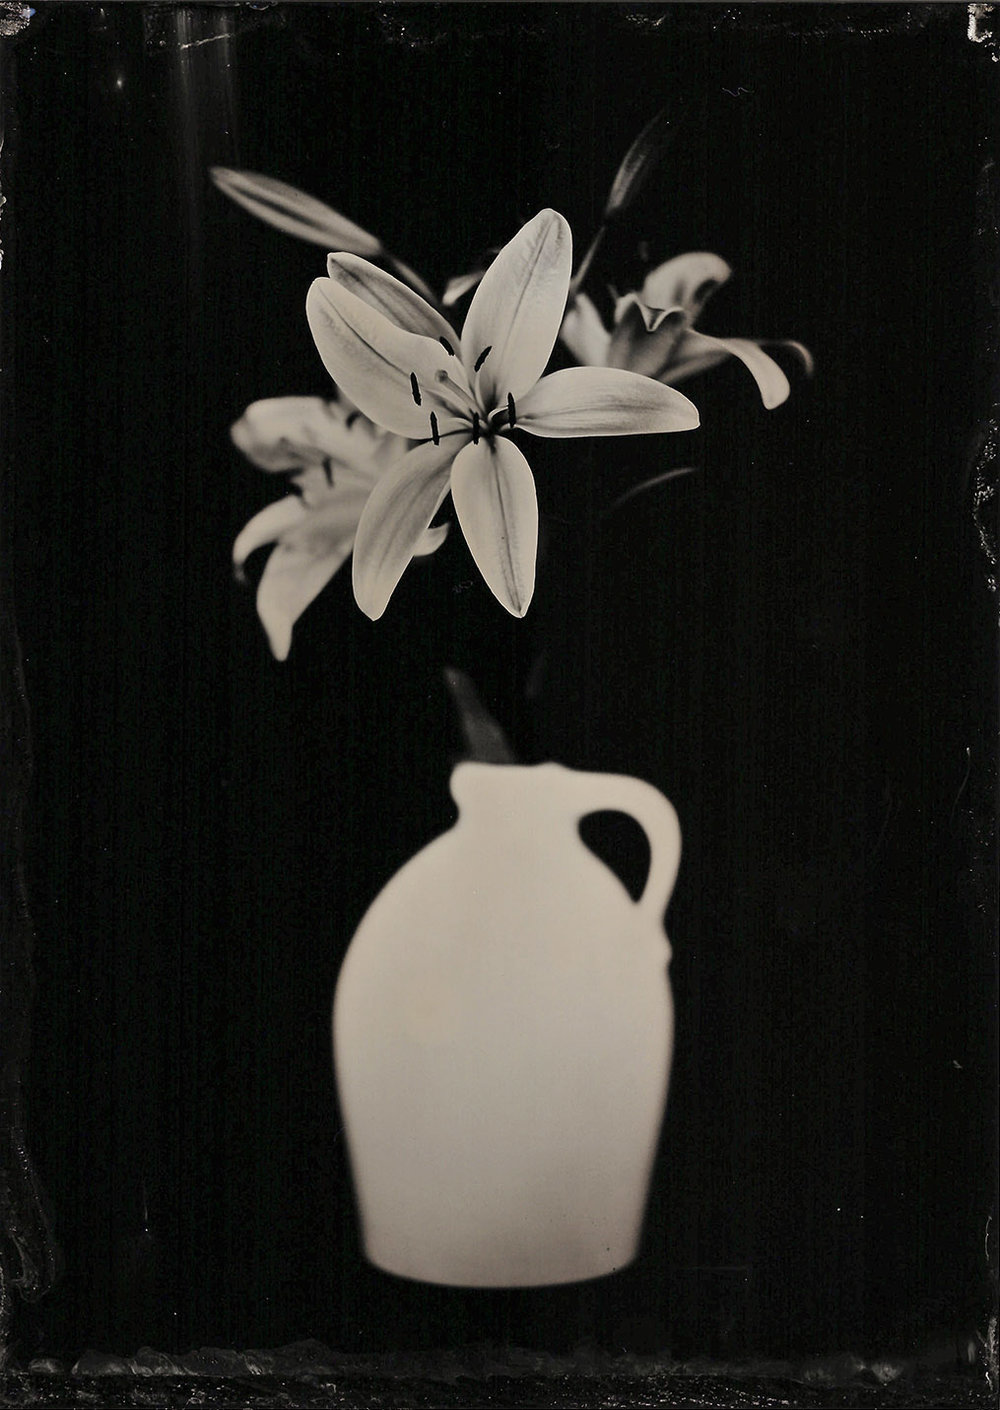 Lilies 1.31.18 - By:Michael Marano  www.973studio.com